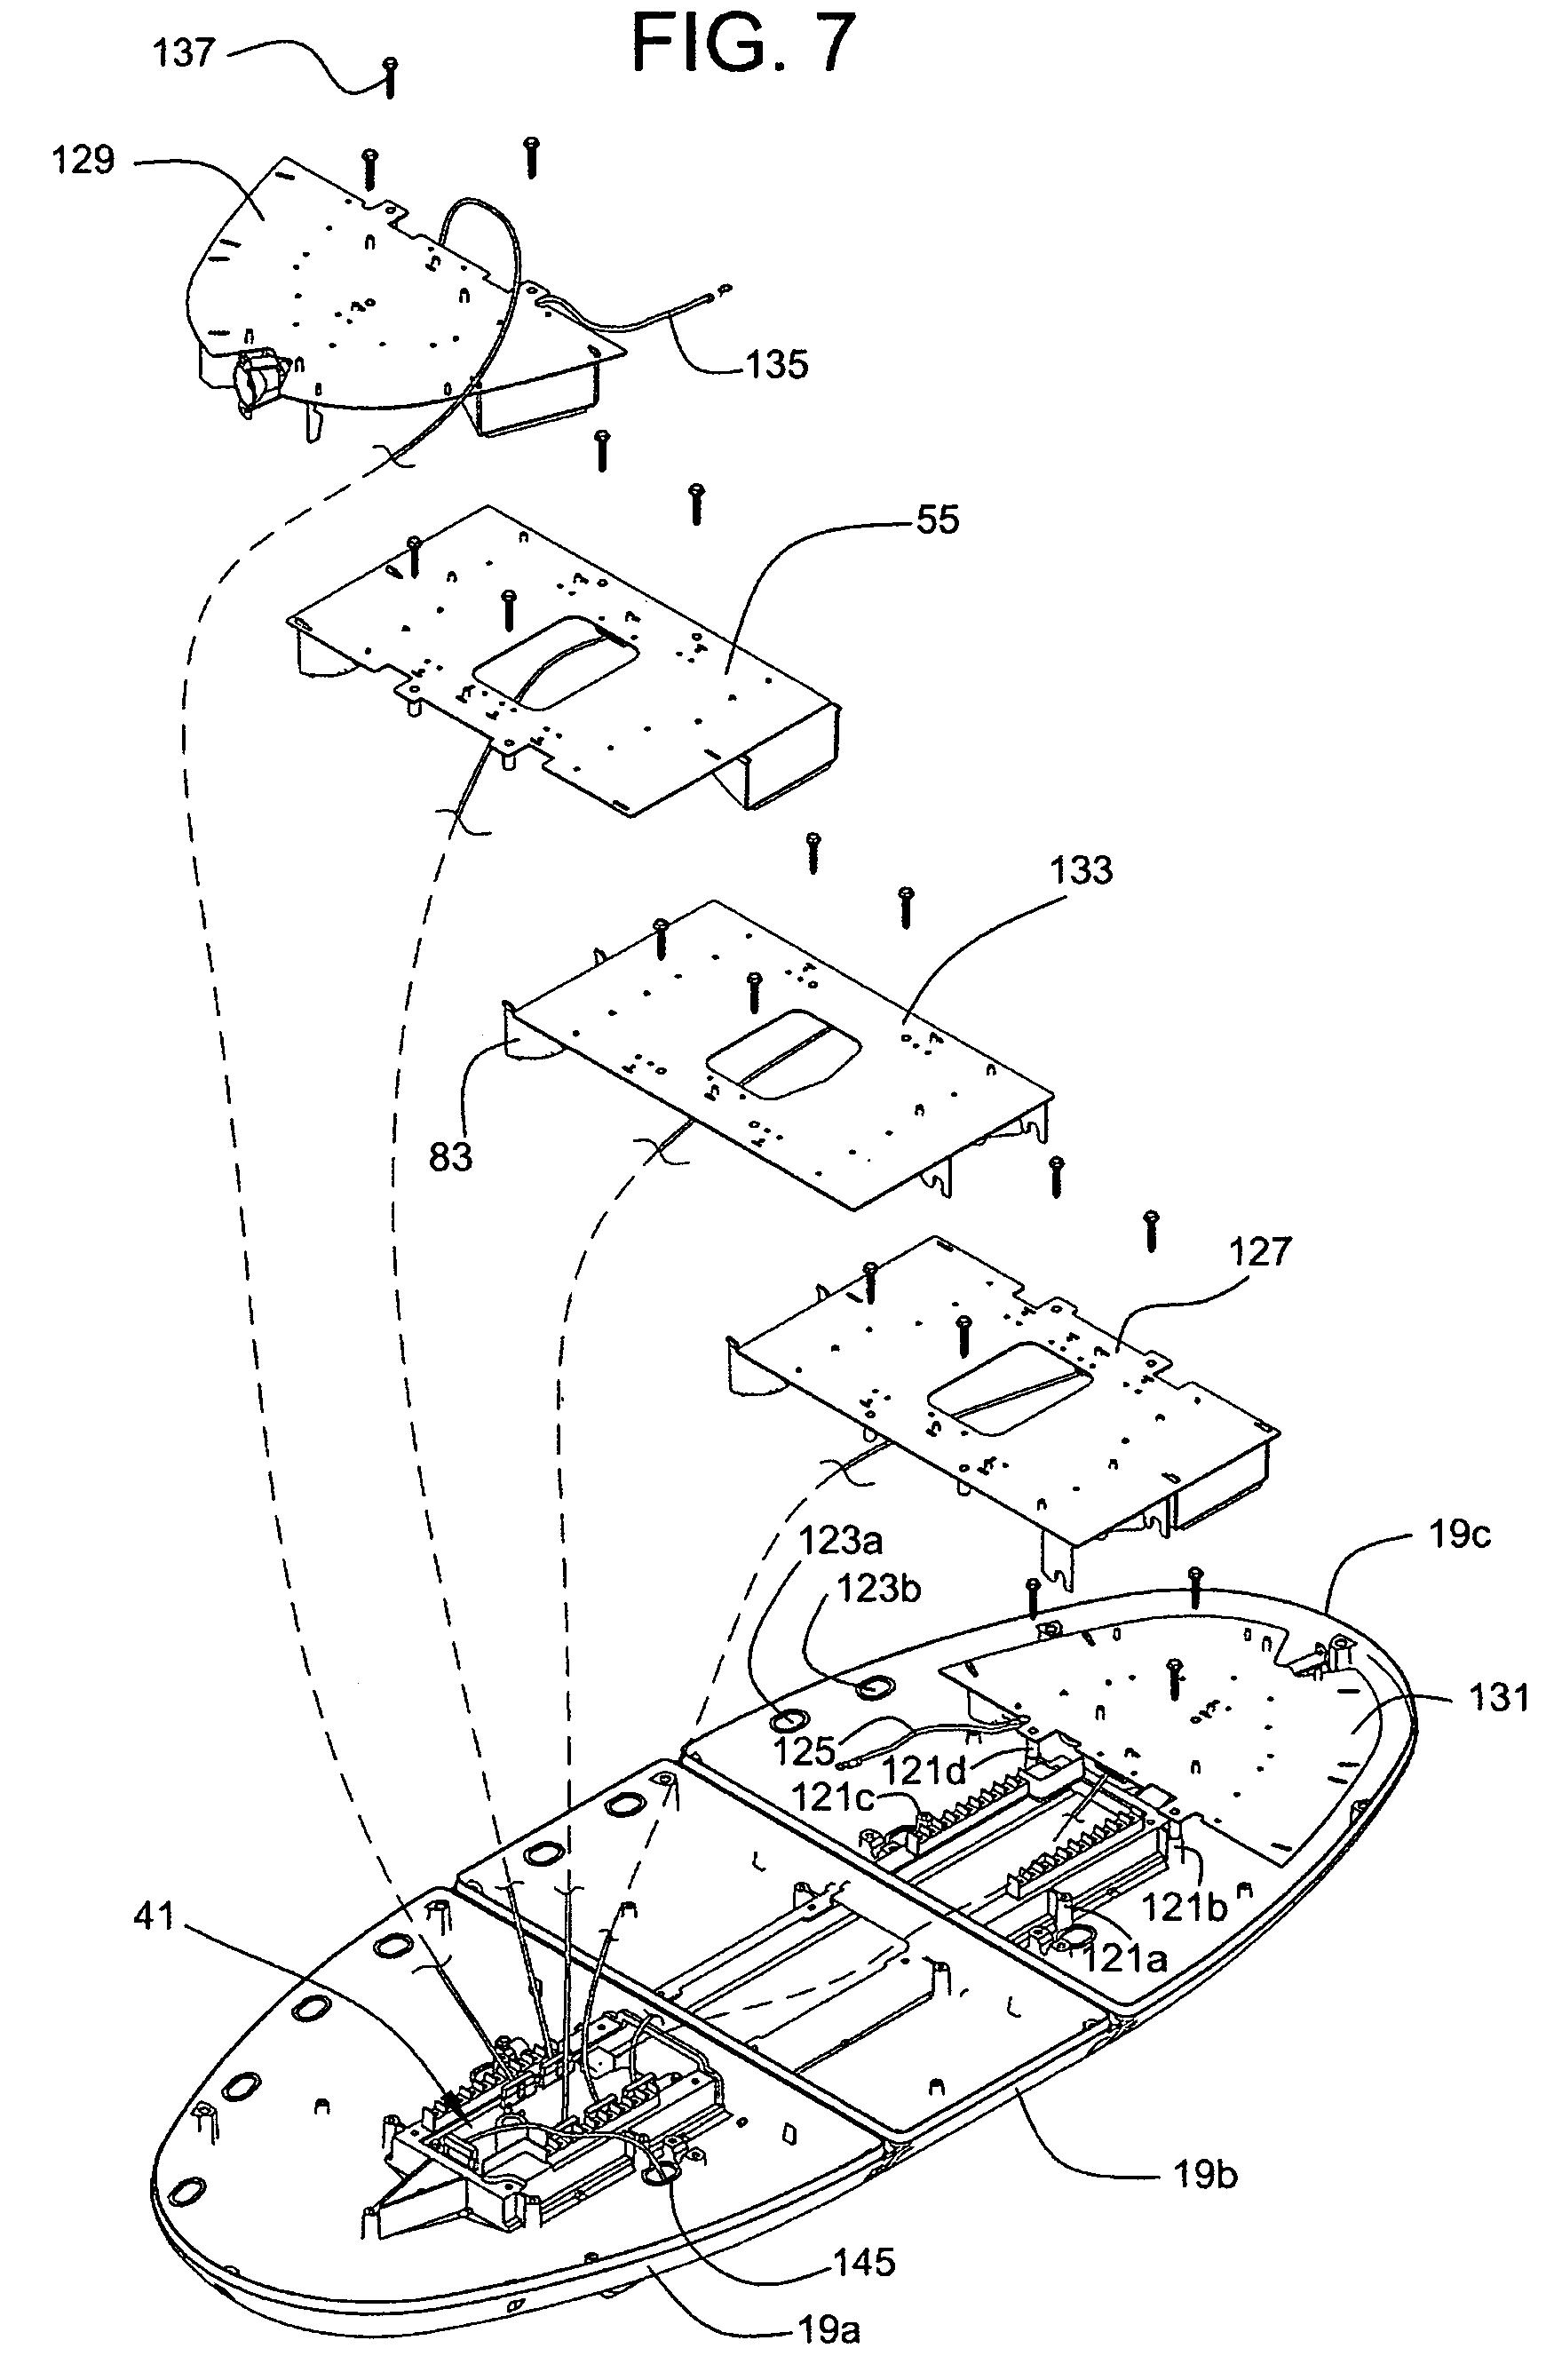 Bl 4137  Code 3 Light Bar Wiring Diagram Federal Signal